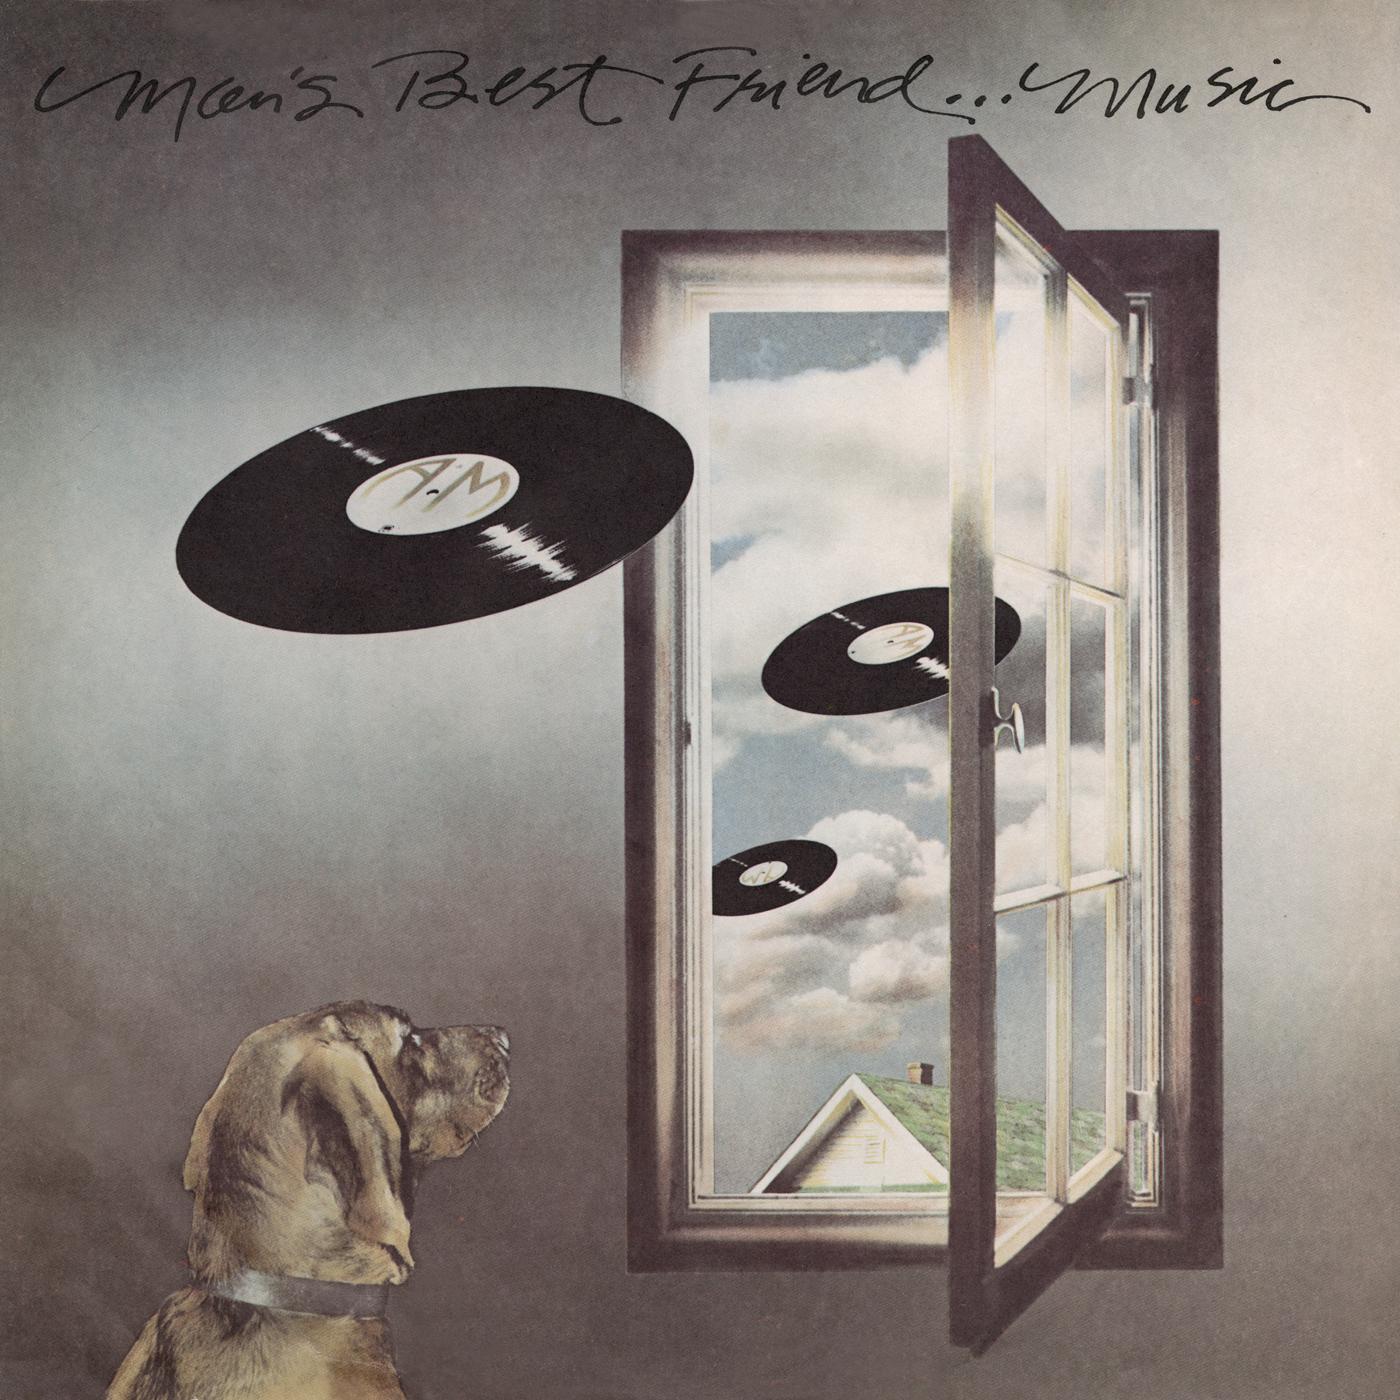 Paul Desmond Summertime Vinyl Album Covers Com